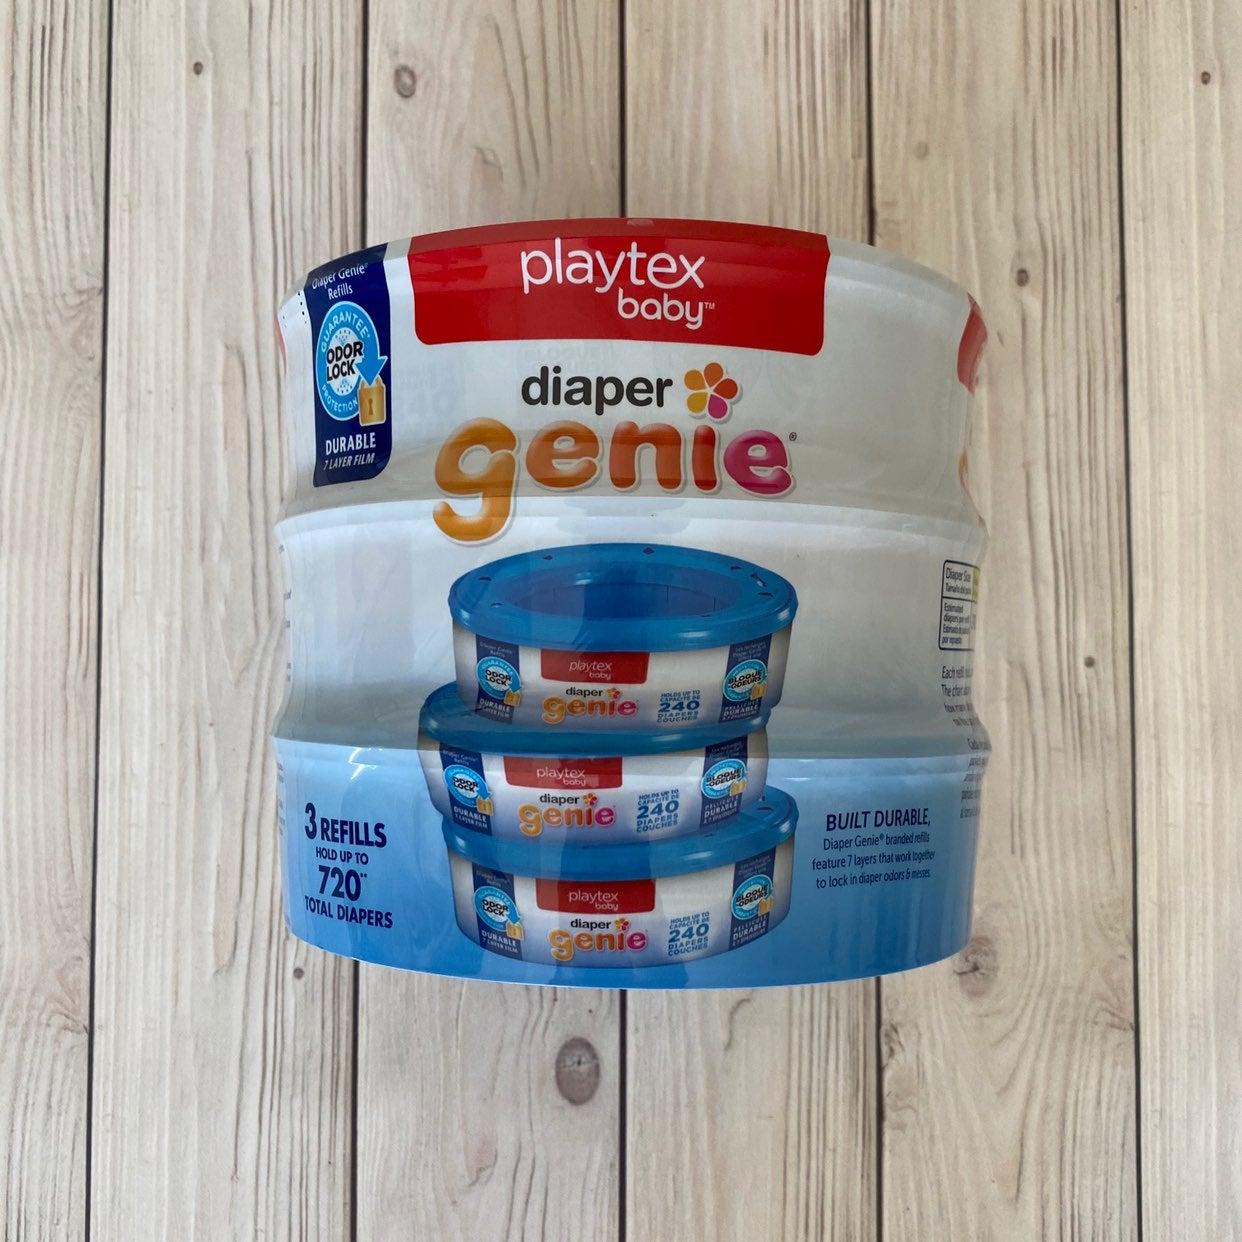 Playtex Baby Diaper Genie 3pk Refill